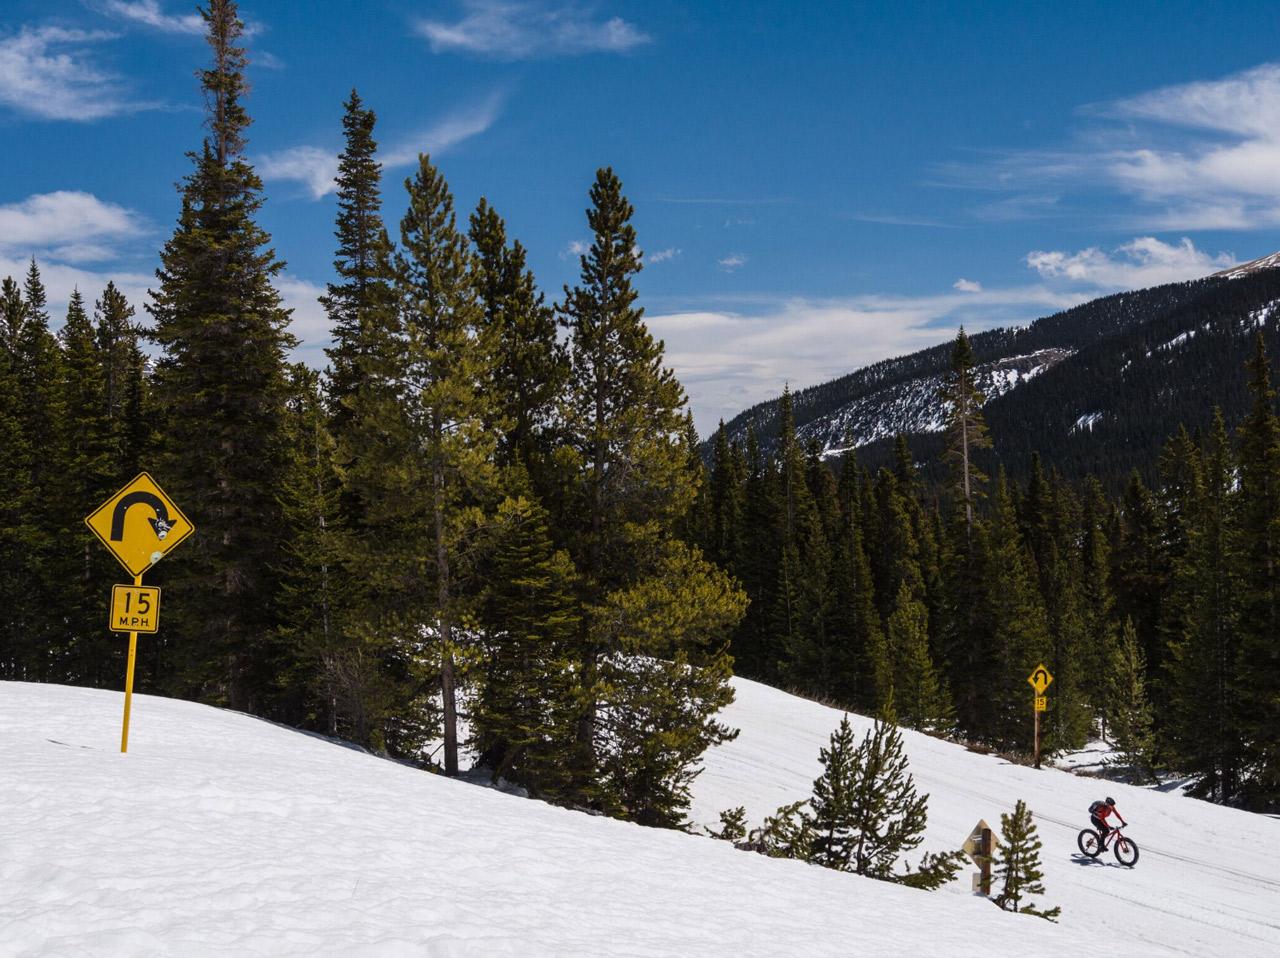 RBR_cottonwood-pass-summit_03